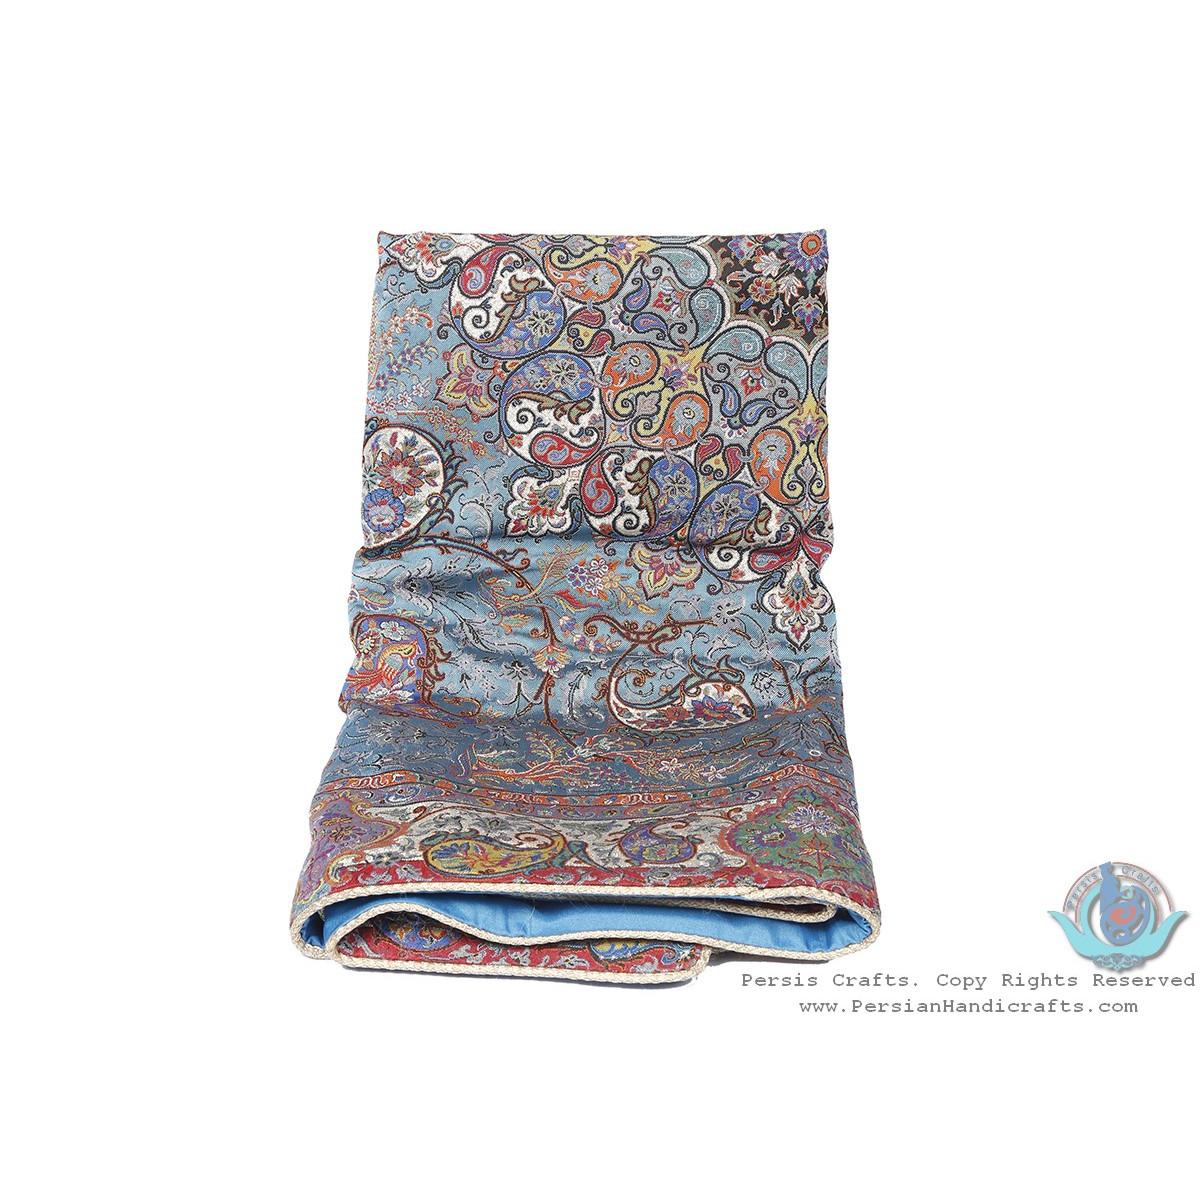 Classy Termeh Paisly & Toranj Design Tablecloth - HT3904-Persian Handicrafts